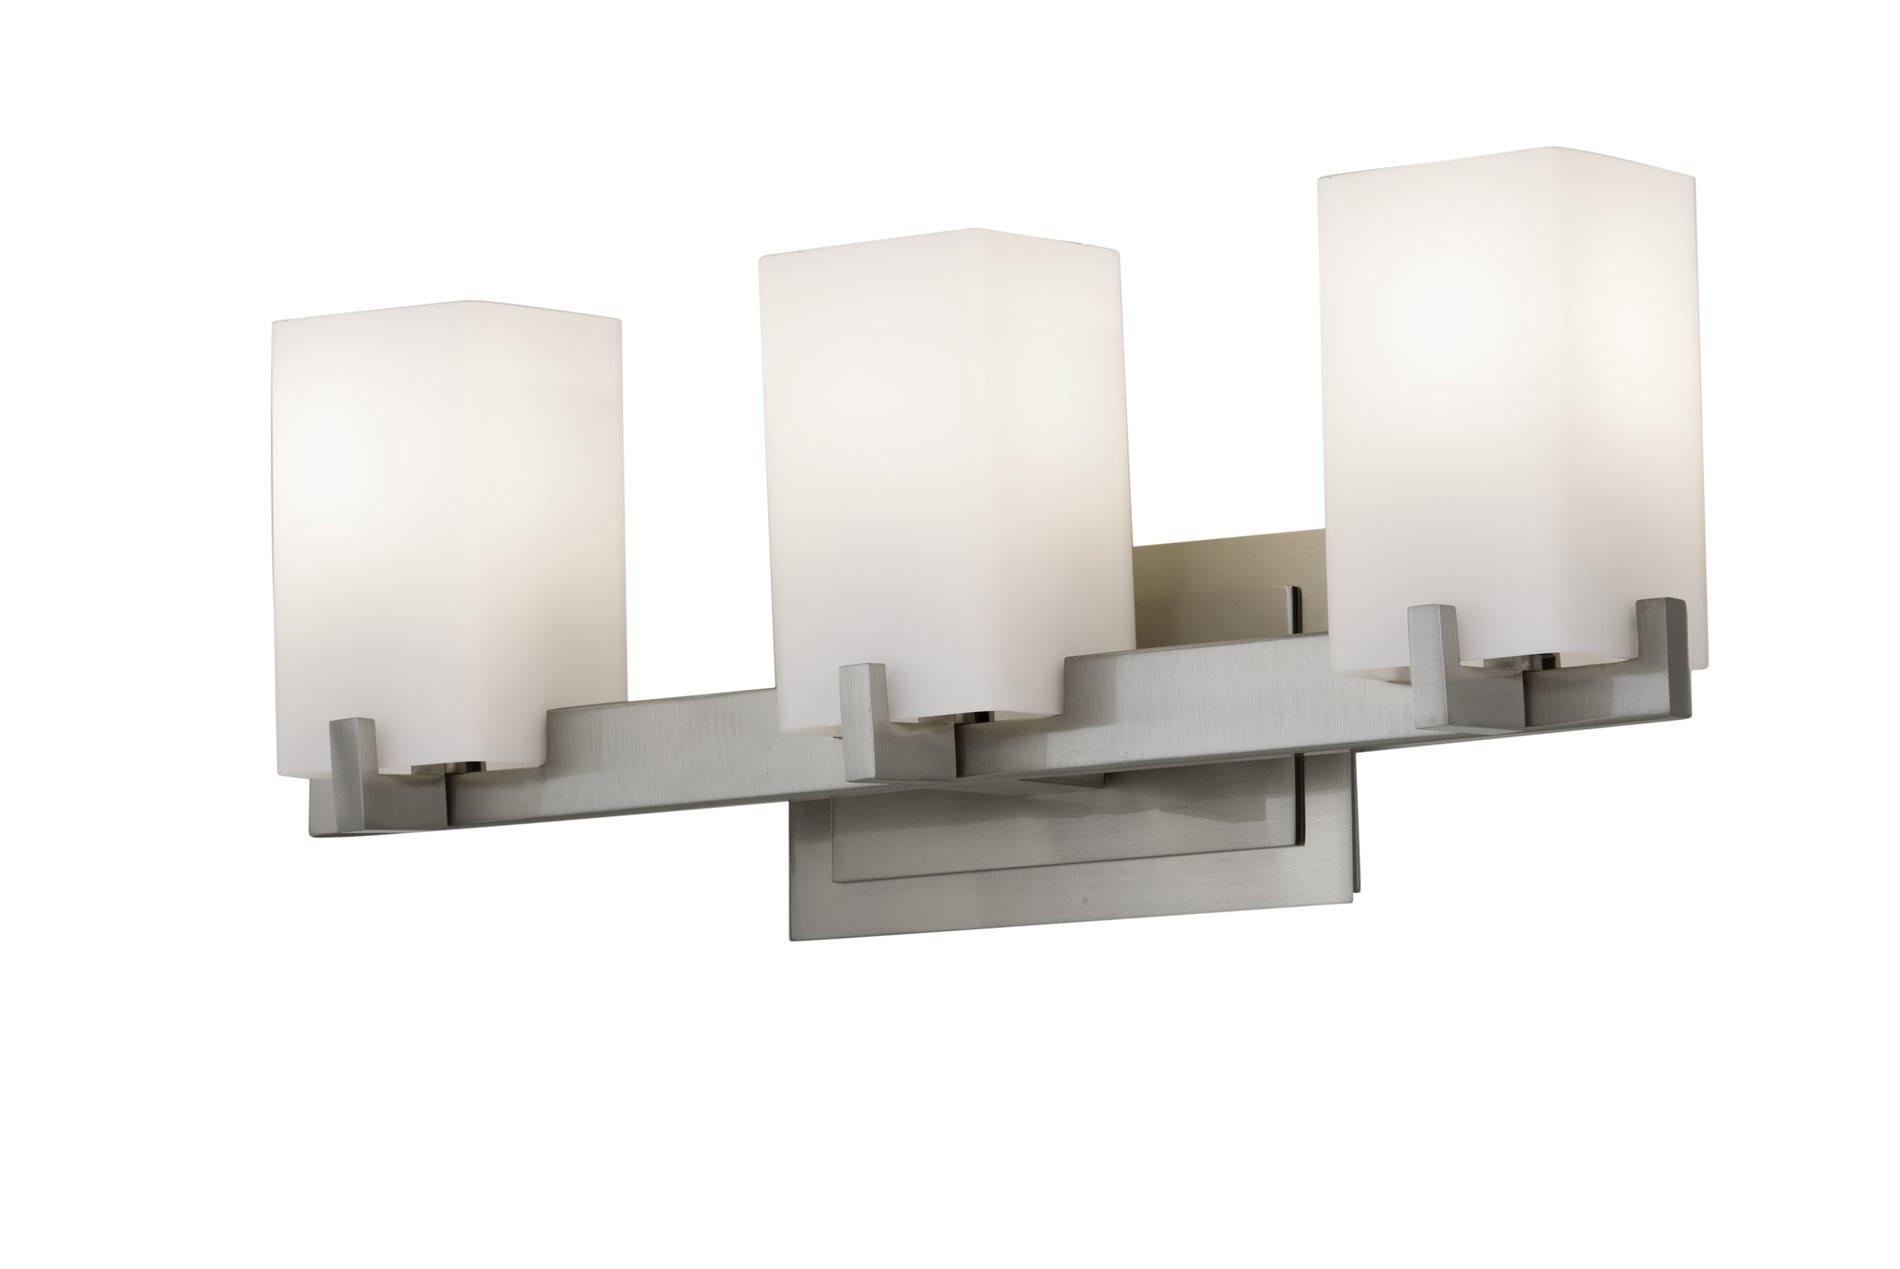 murray feiss vs18403 bs riva contemporary bathroom vanity light mrf. Black Bedroom Furniture Sets. Home Design Ideas